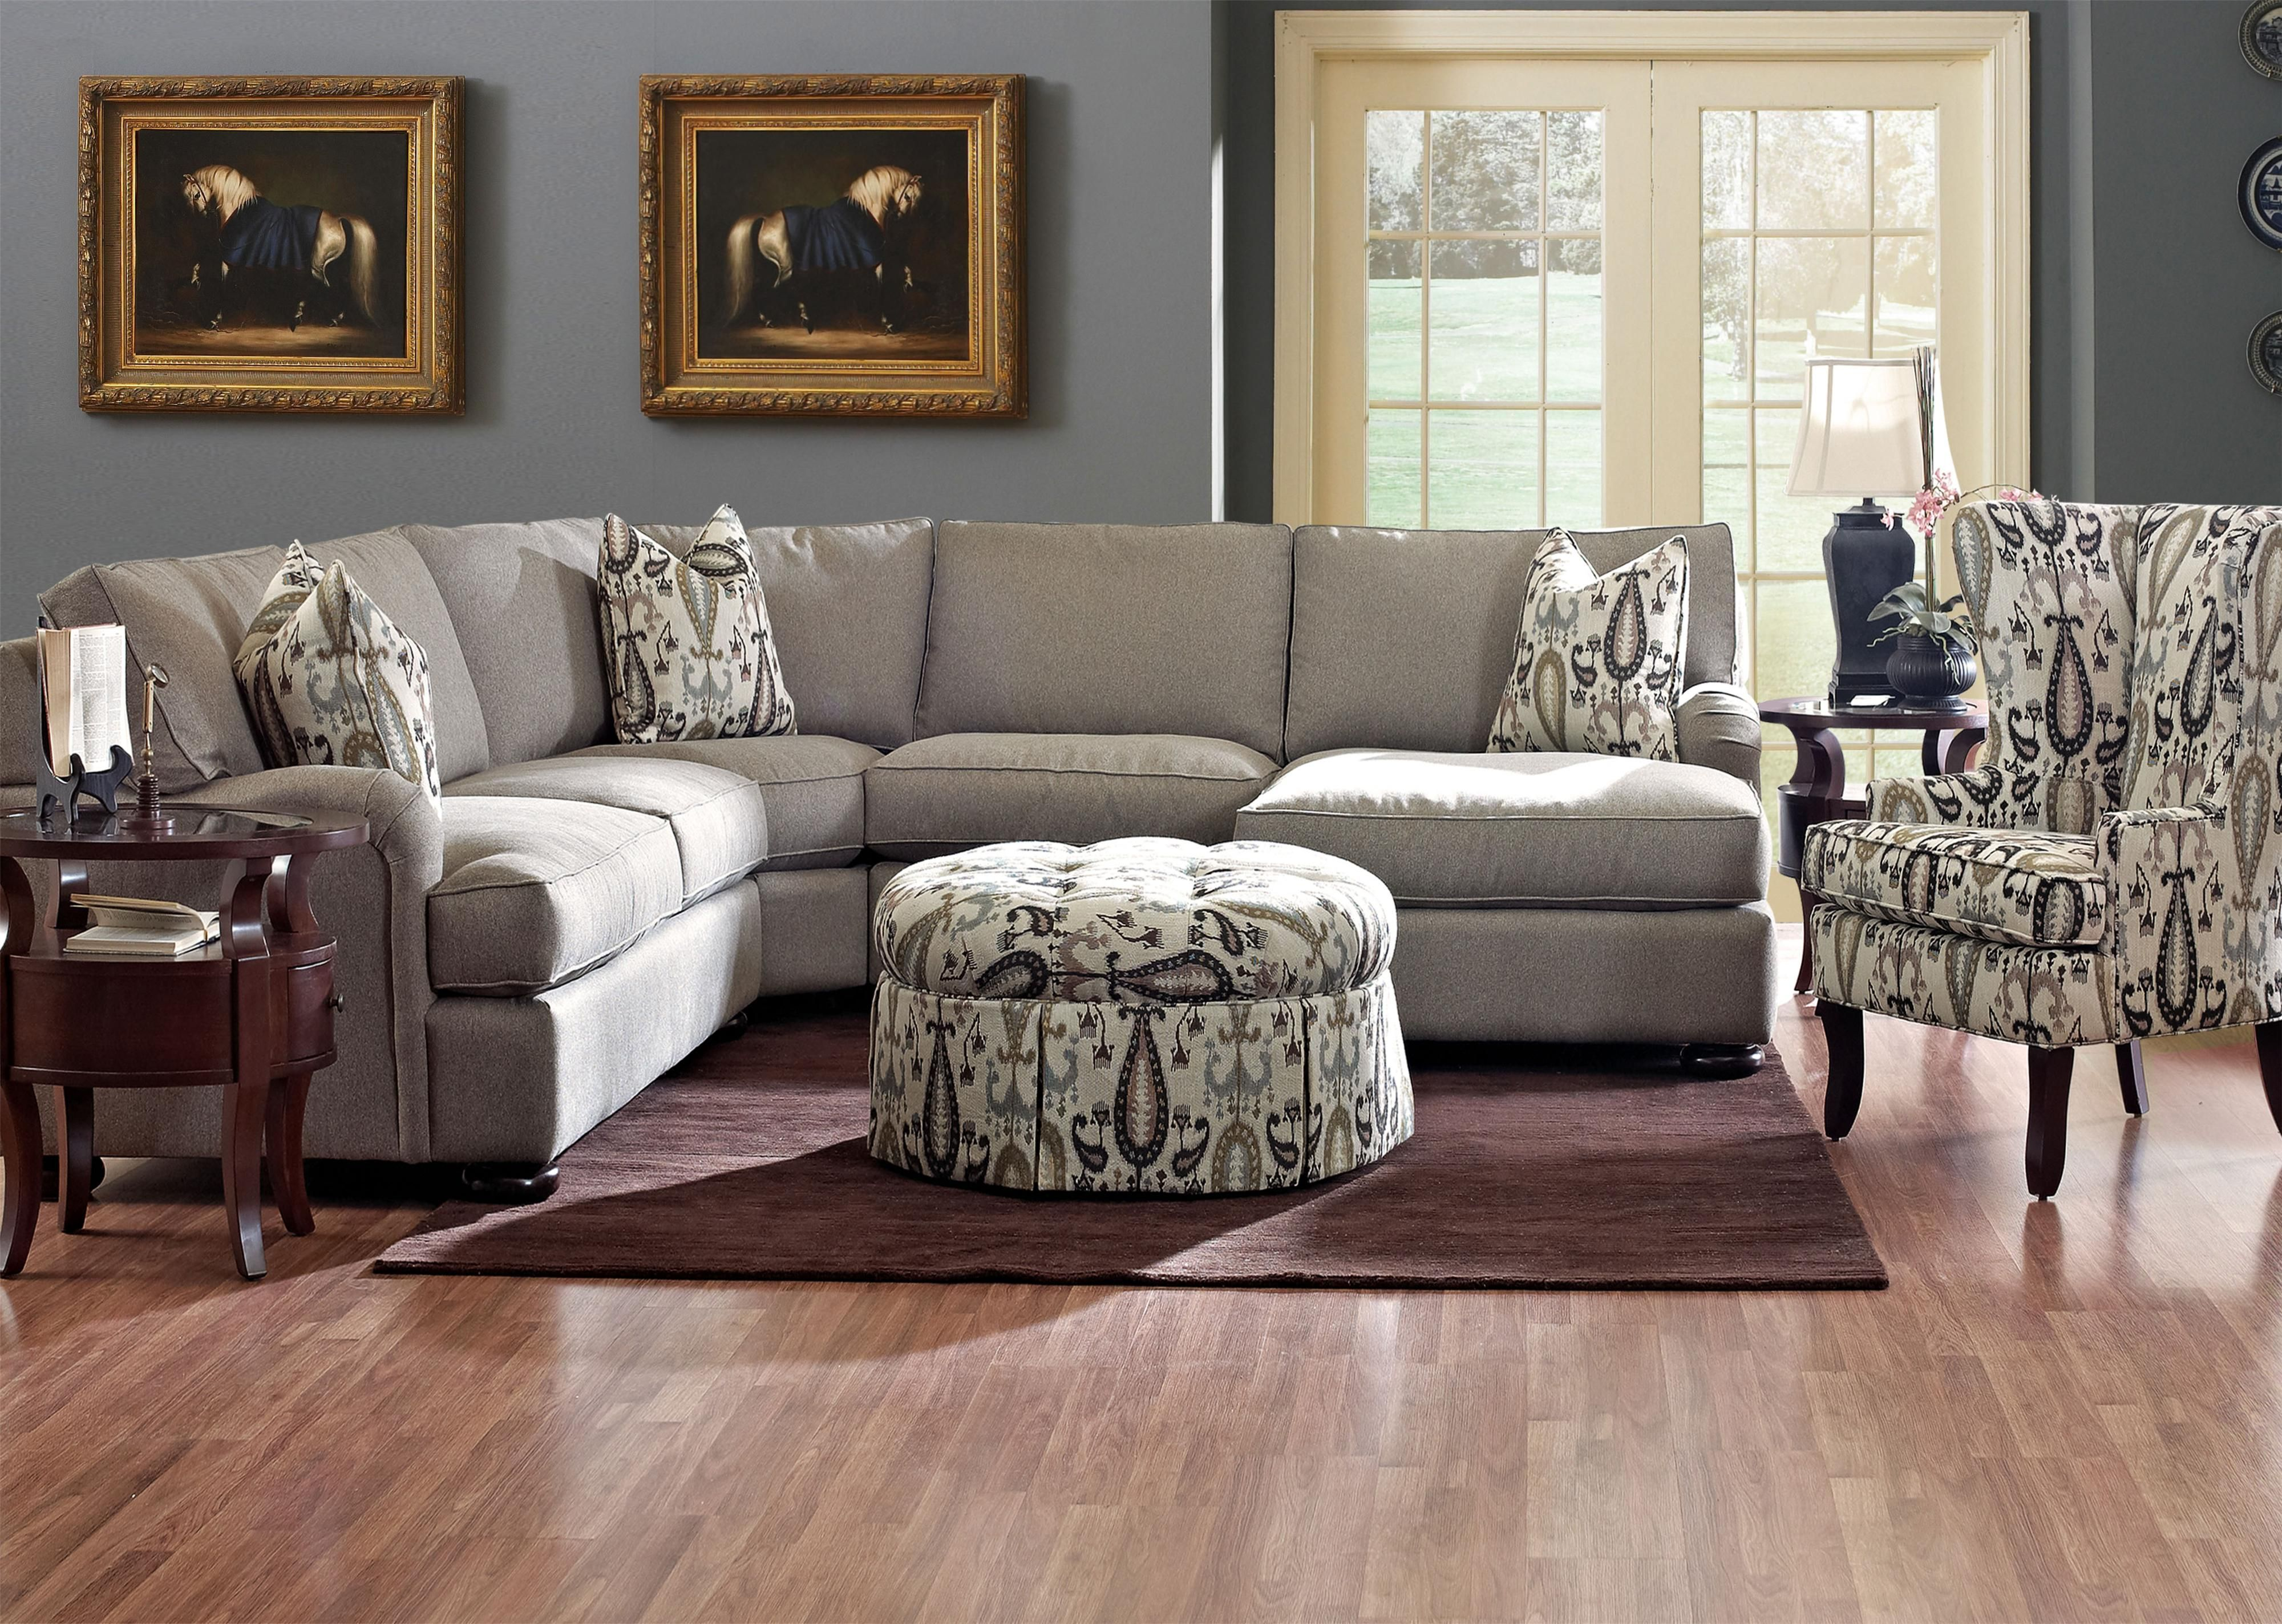 New york monroe county henrietta - Metropia Killian Traditional Four Seater Sectional Sofa With Chaise Ruby Gordon Home Furnishings Sofa